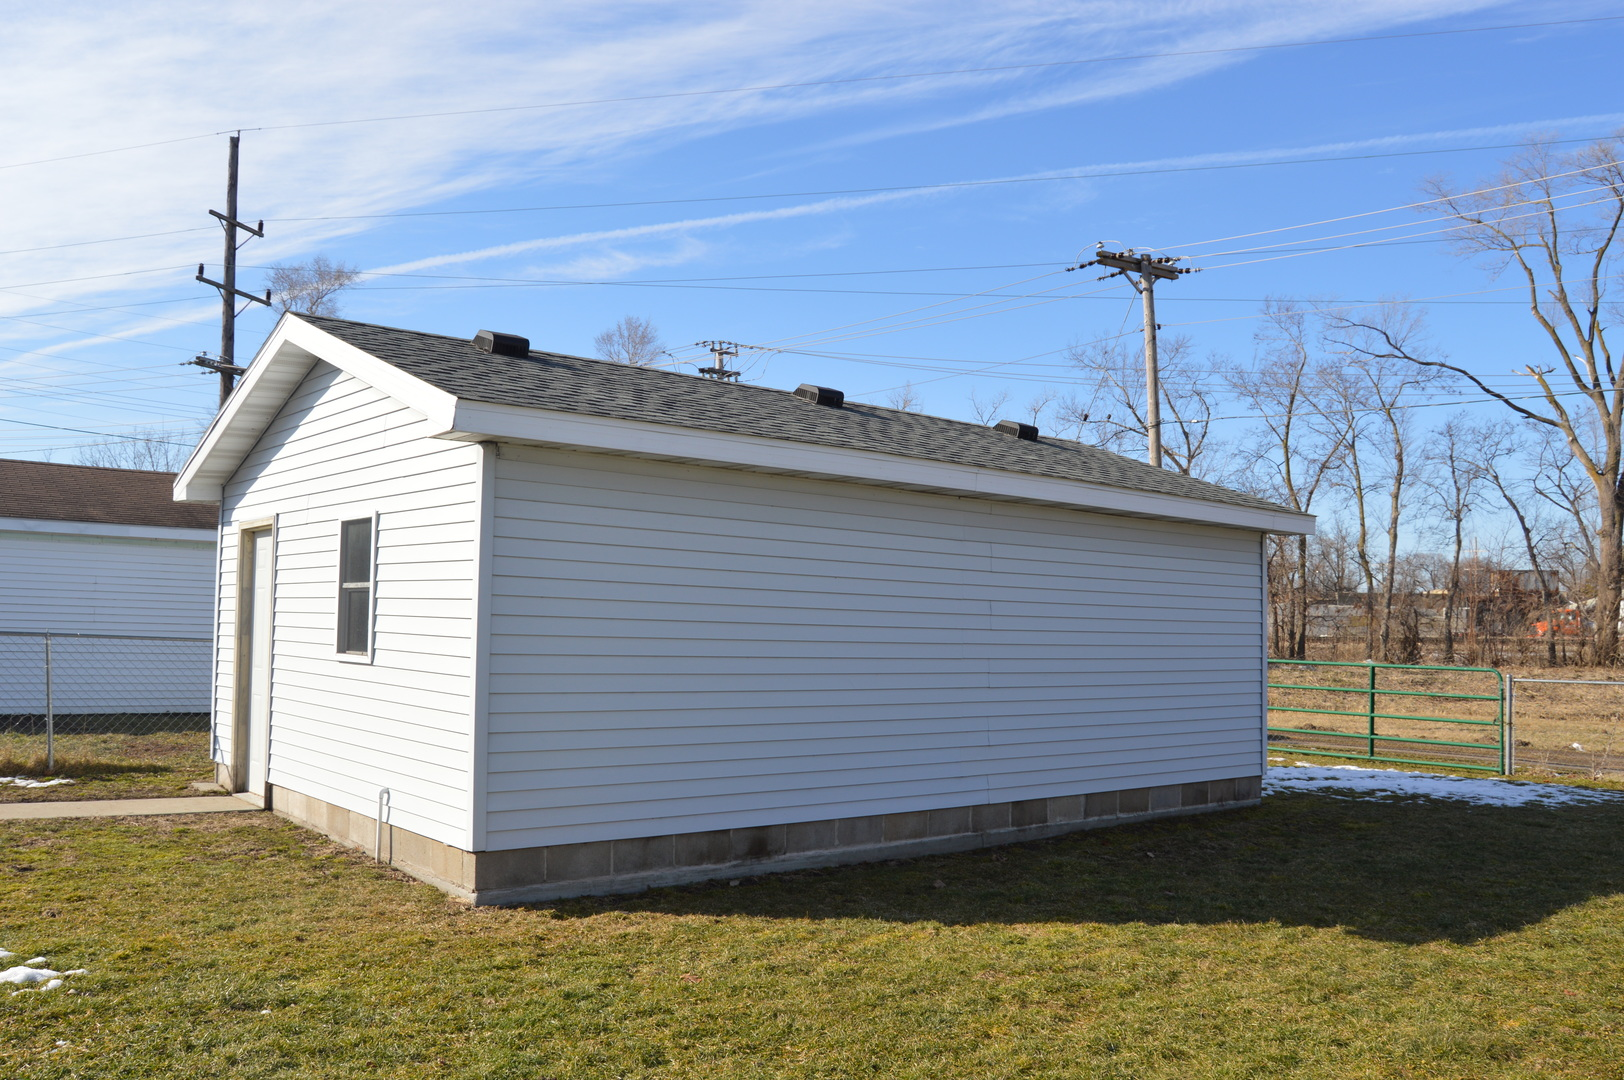 146 West WALNUT, Coal City, Illinois, 60416